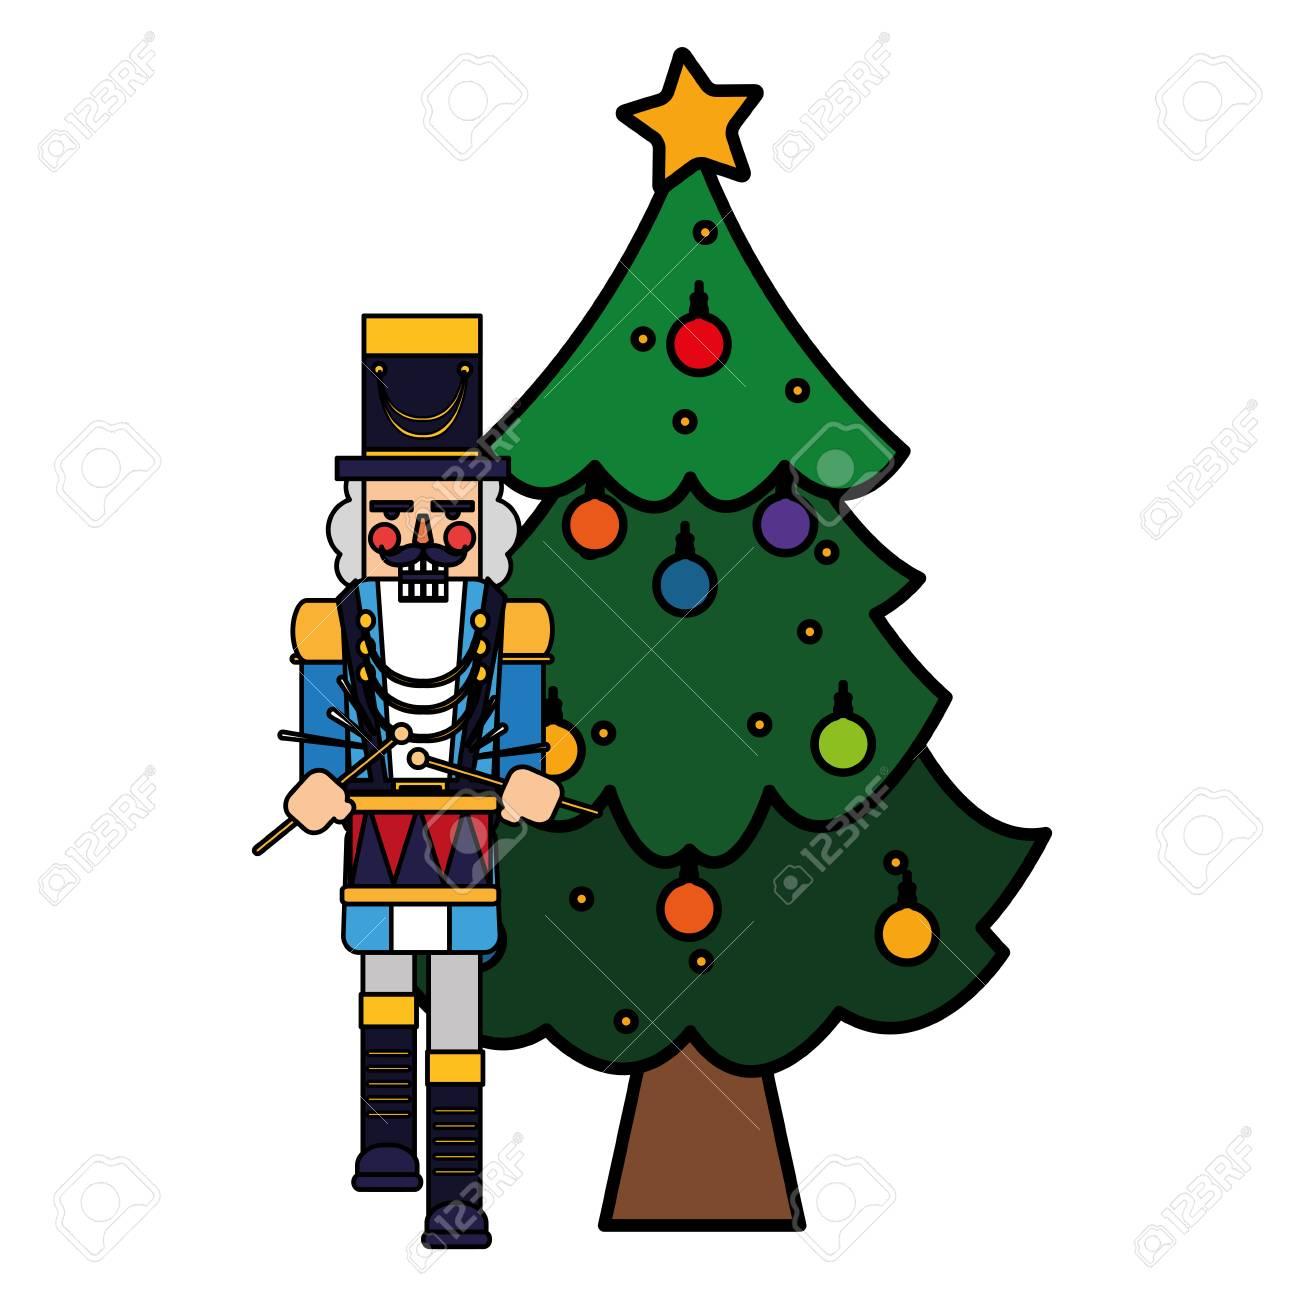 Nutcracker Christmas Tree Clipart.Christmas Tree And Nutcracker Over White Background Vector Illustration